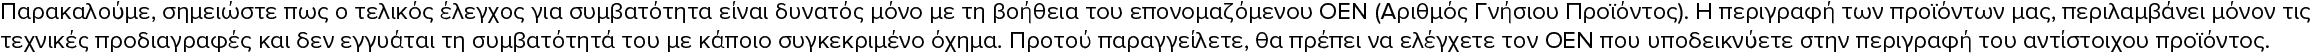 MANN-FILTER 4920158, 1103827, 4-9540000111, 76-12915035151, 05740004 Φίλτρο λαδιού